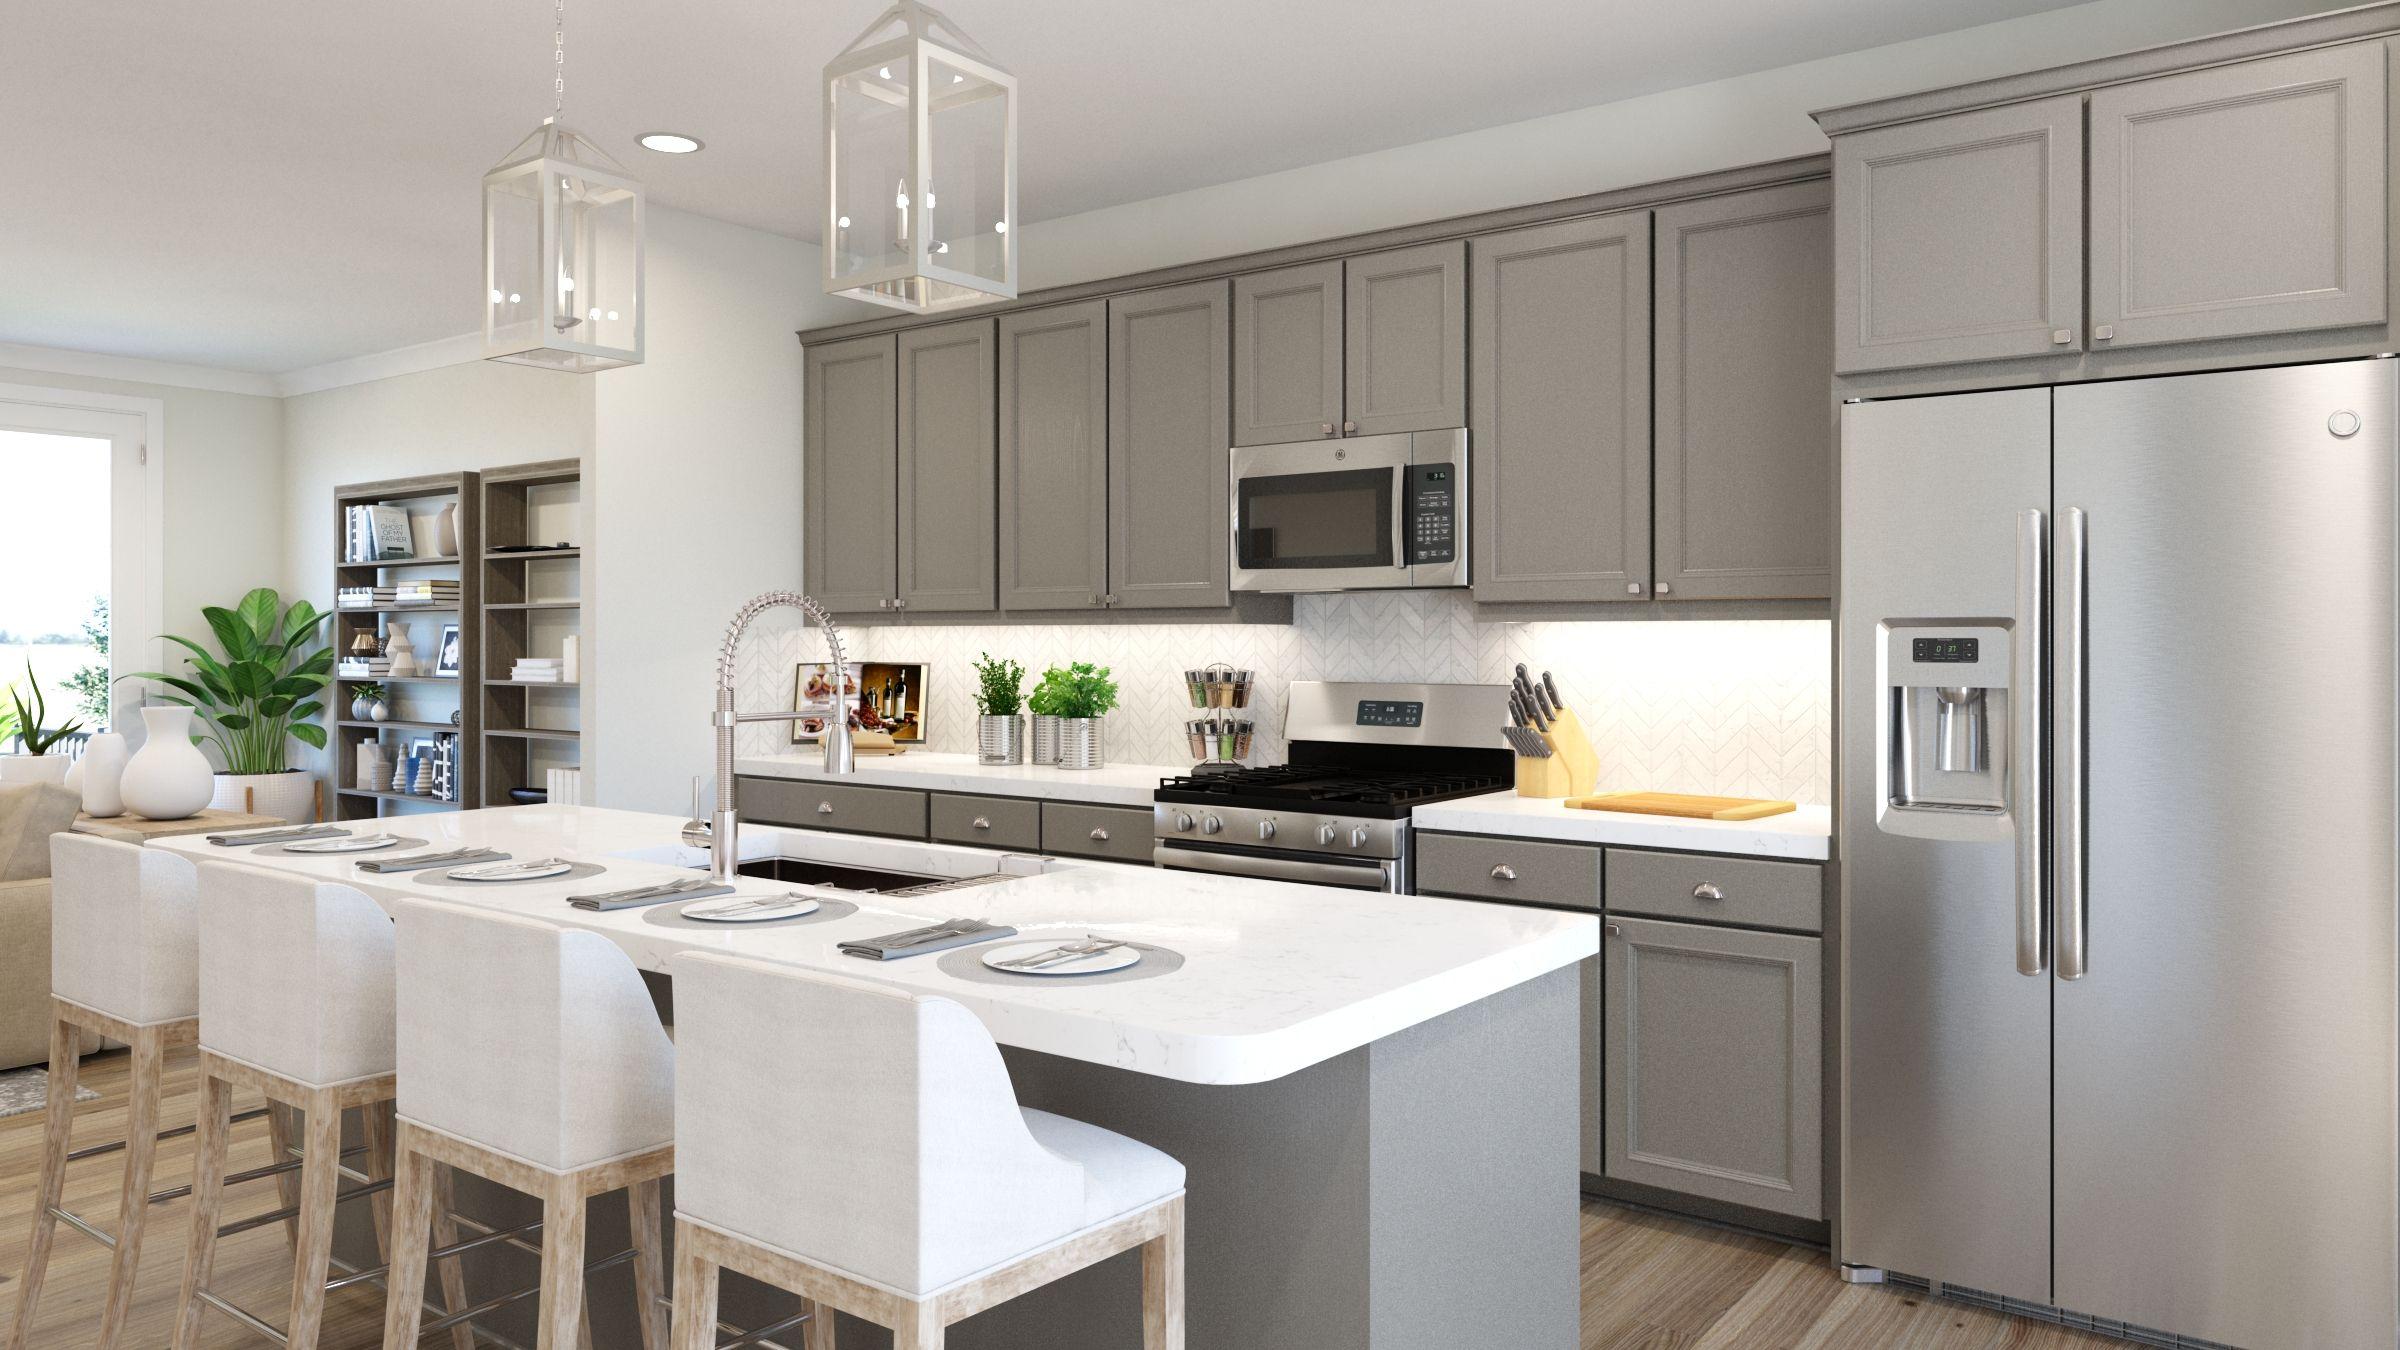 Kitchen featured in the Tristan By Van Metre Homes in Washington, VA